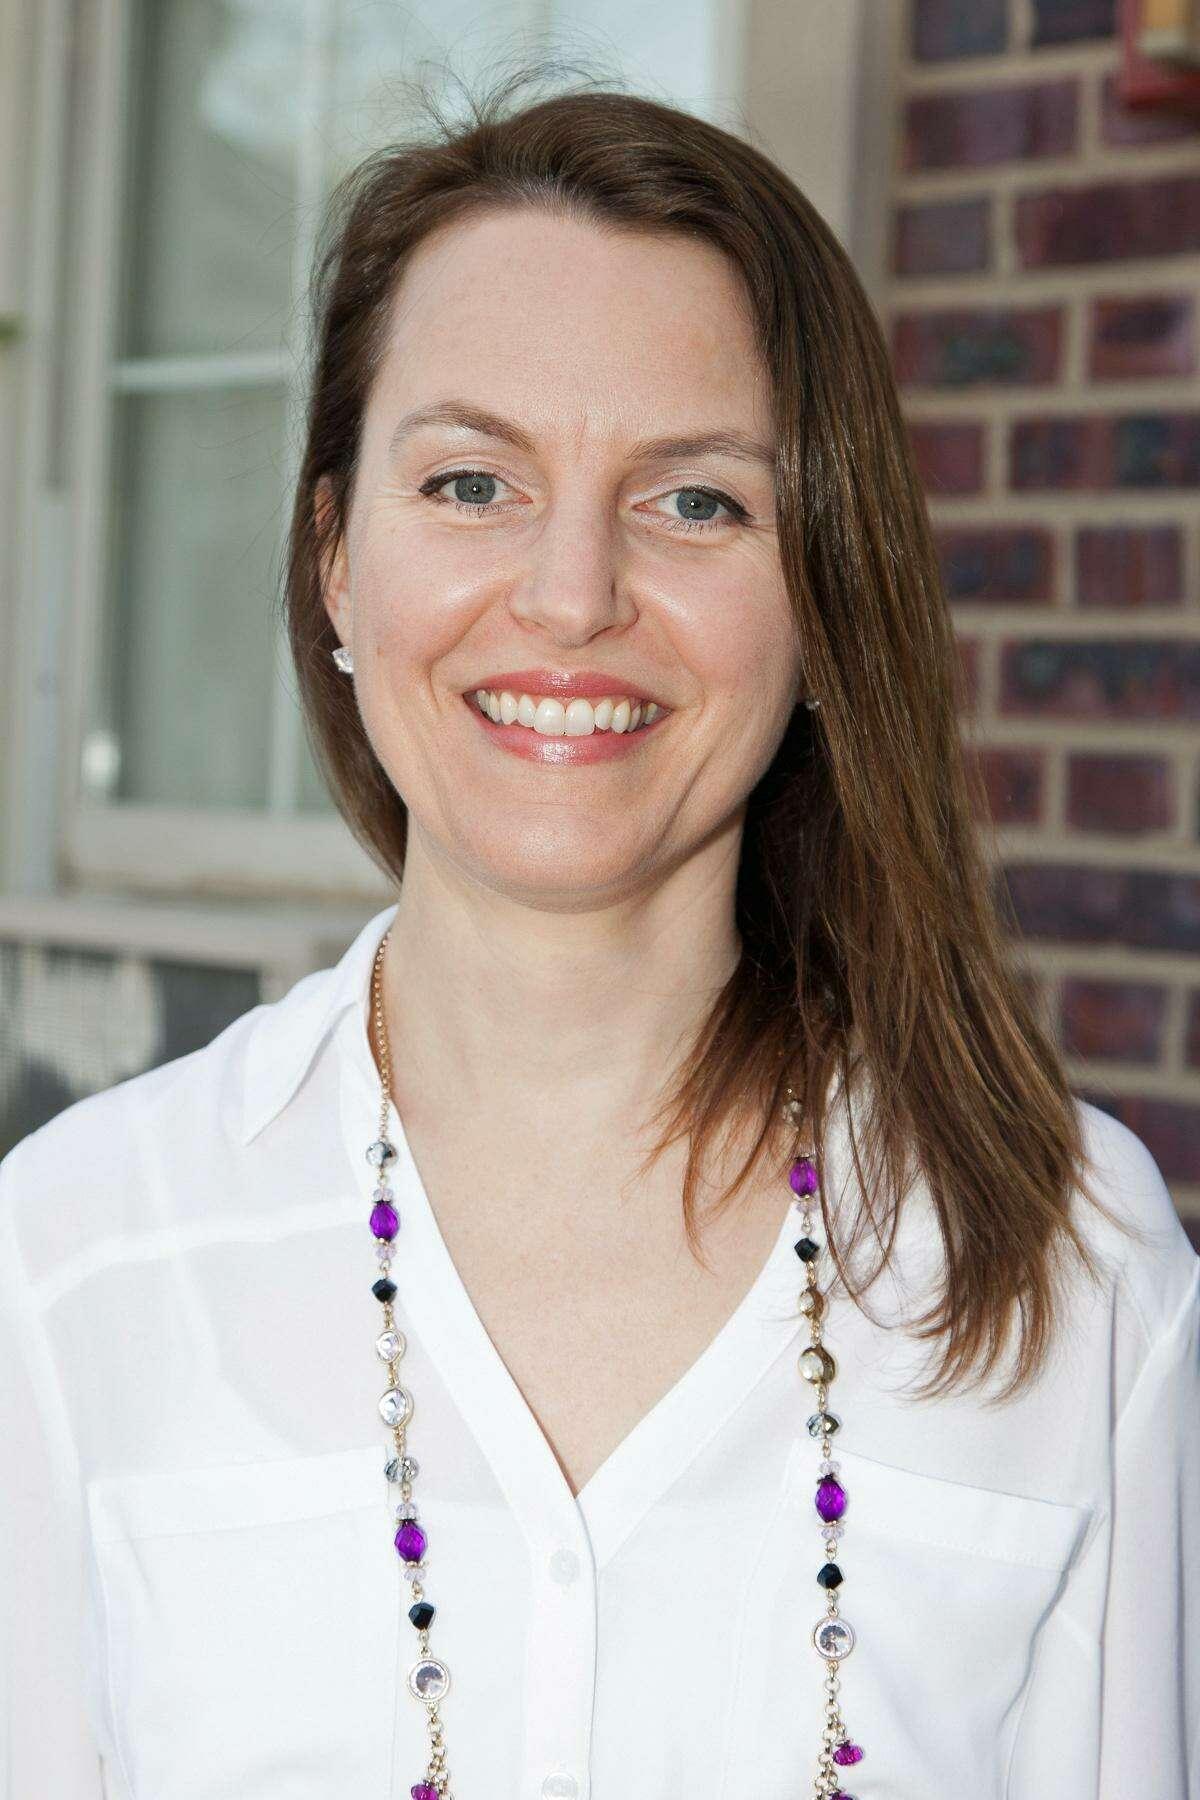 GHS science teacher Sarah Goldin